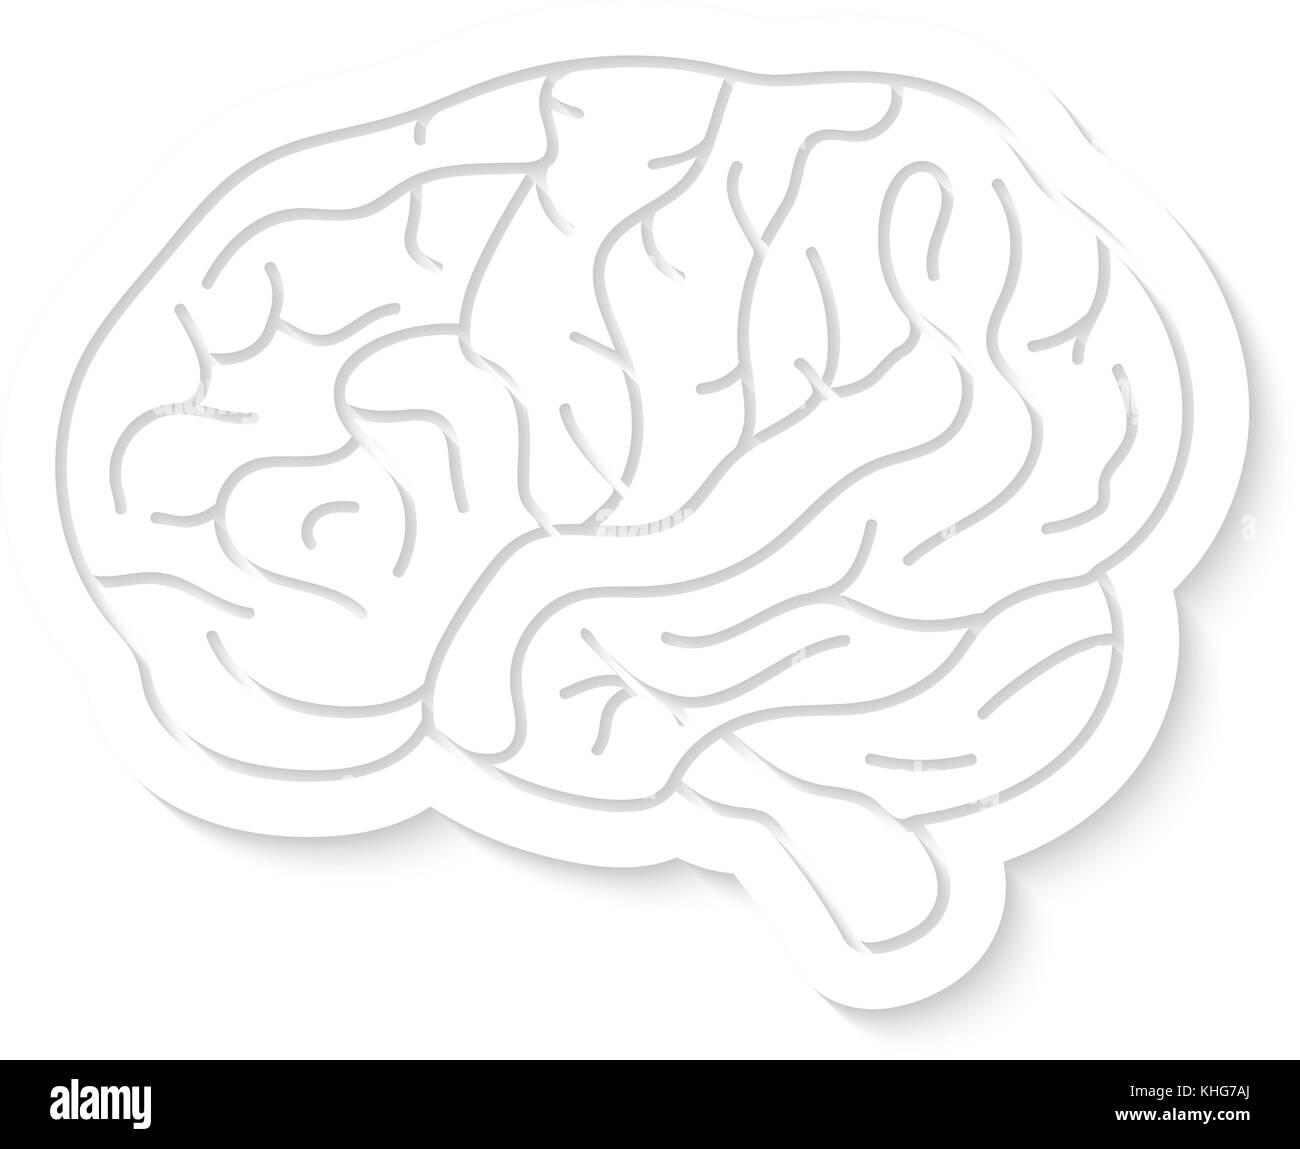 white brain icon with shadow - Stock Image